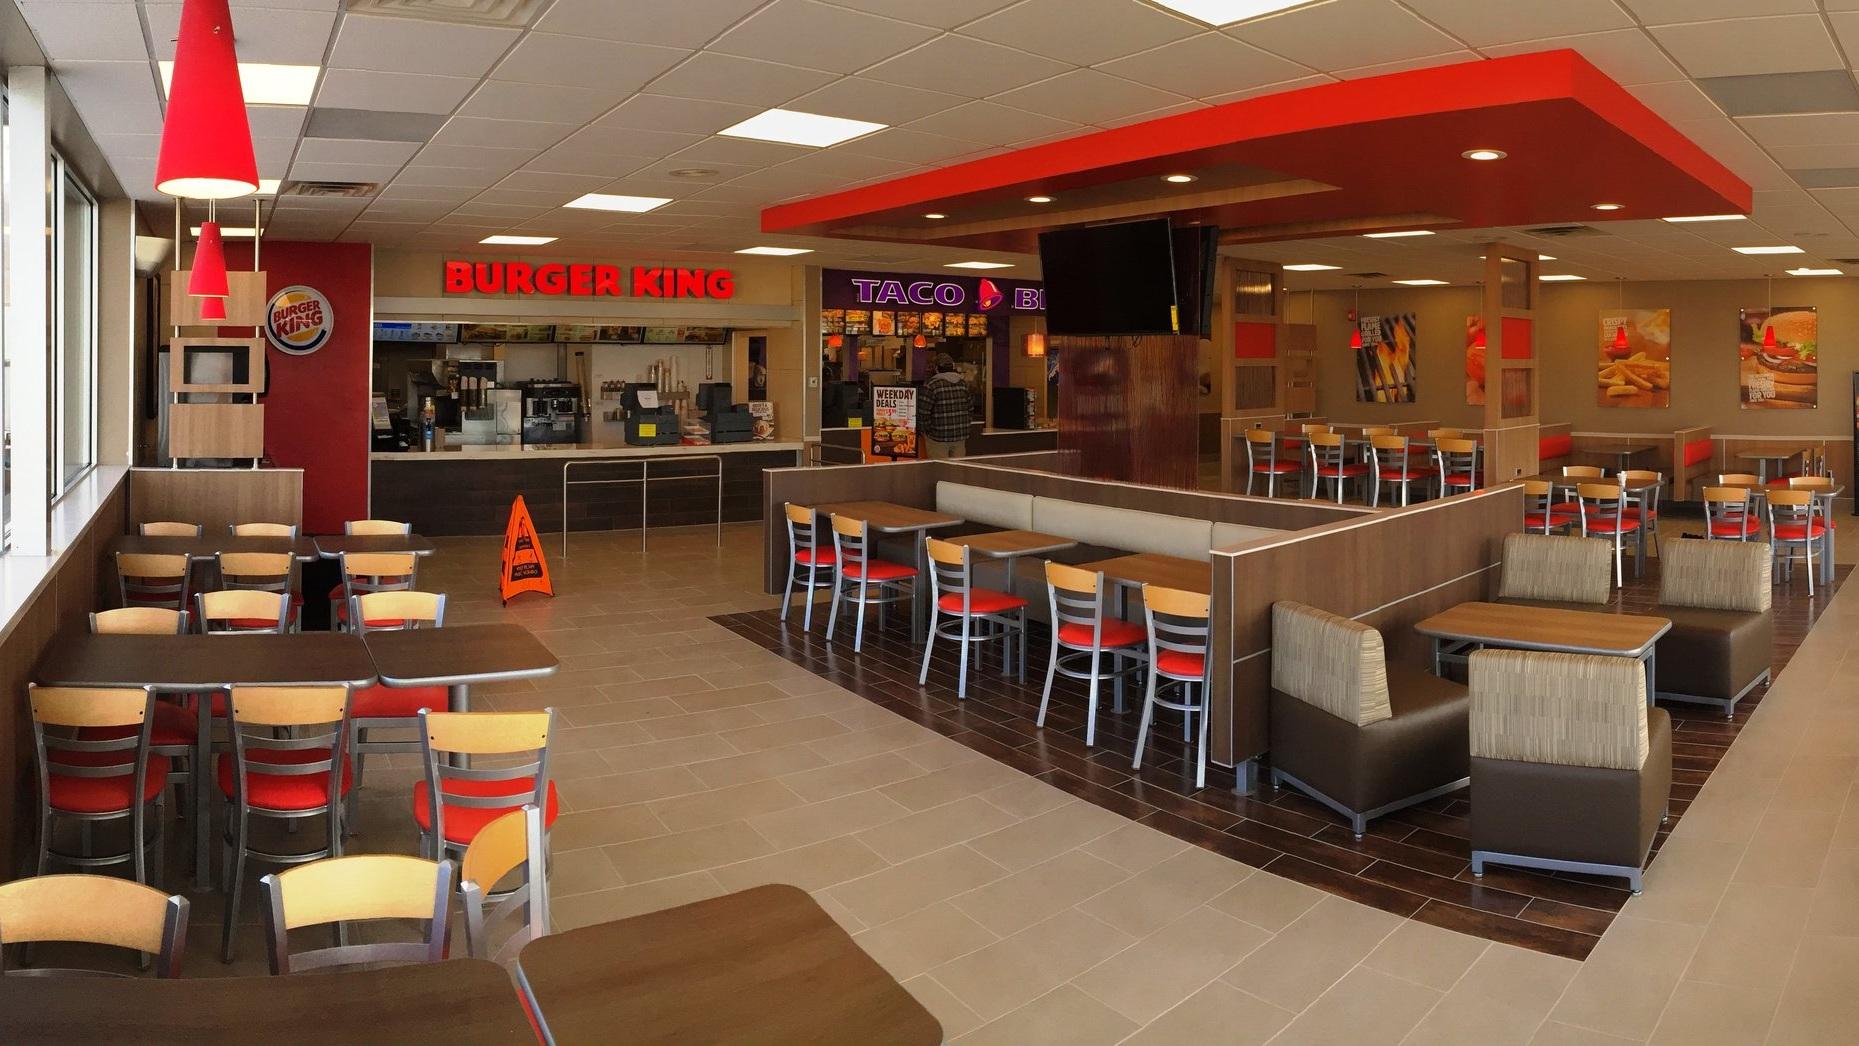 Burger King / Taco Bell -